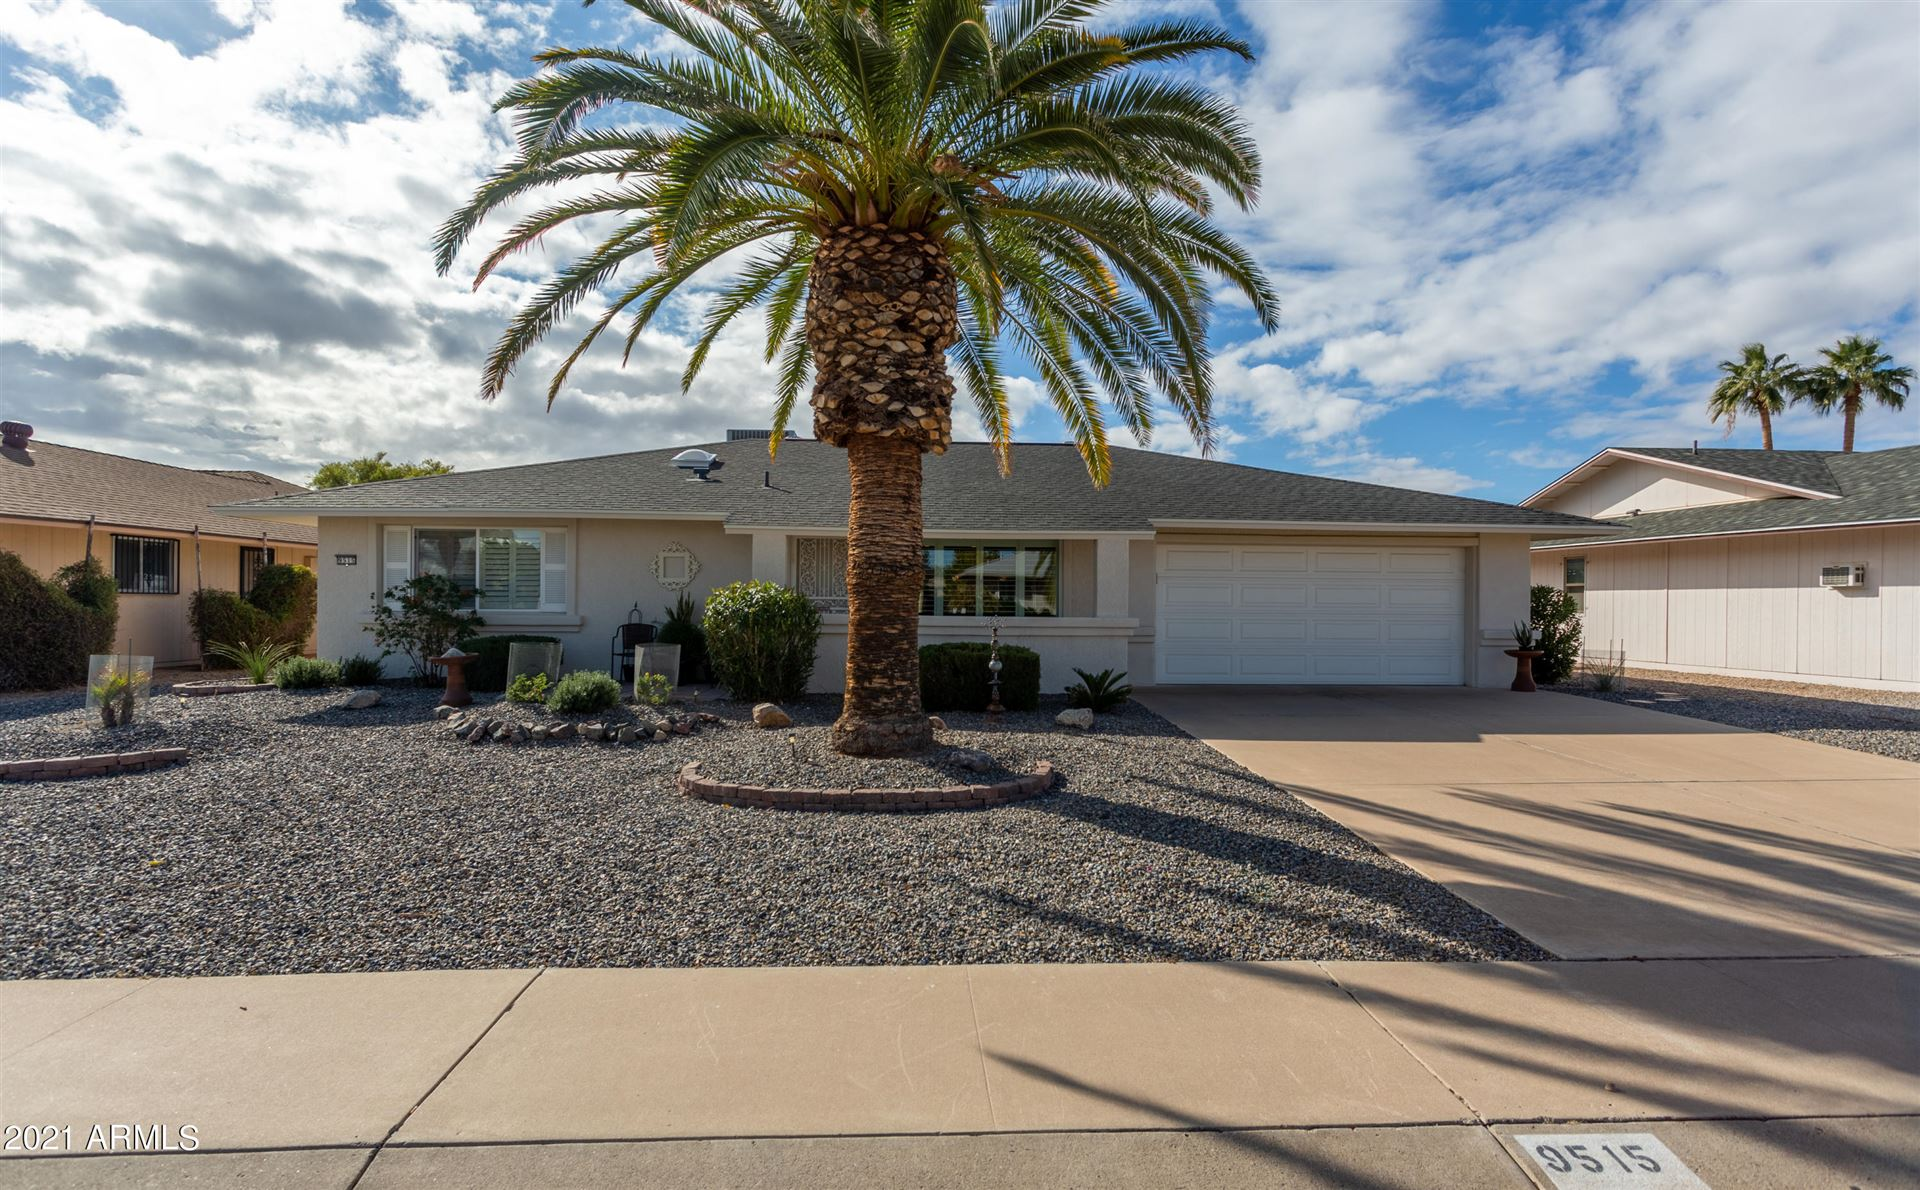 Photo of 9515 W LINDGREN Avenue, Sun City, AZ 85373 (MLS # 6201790)